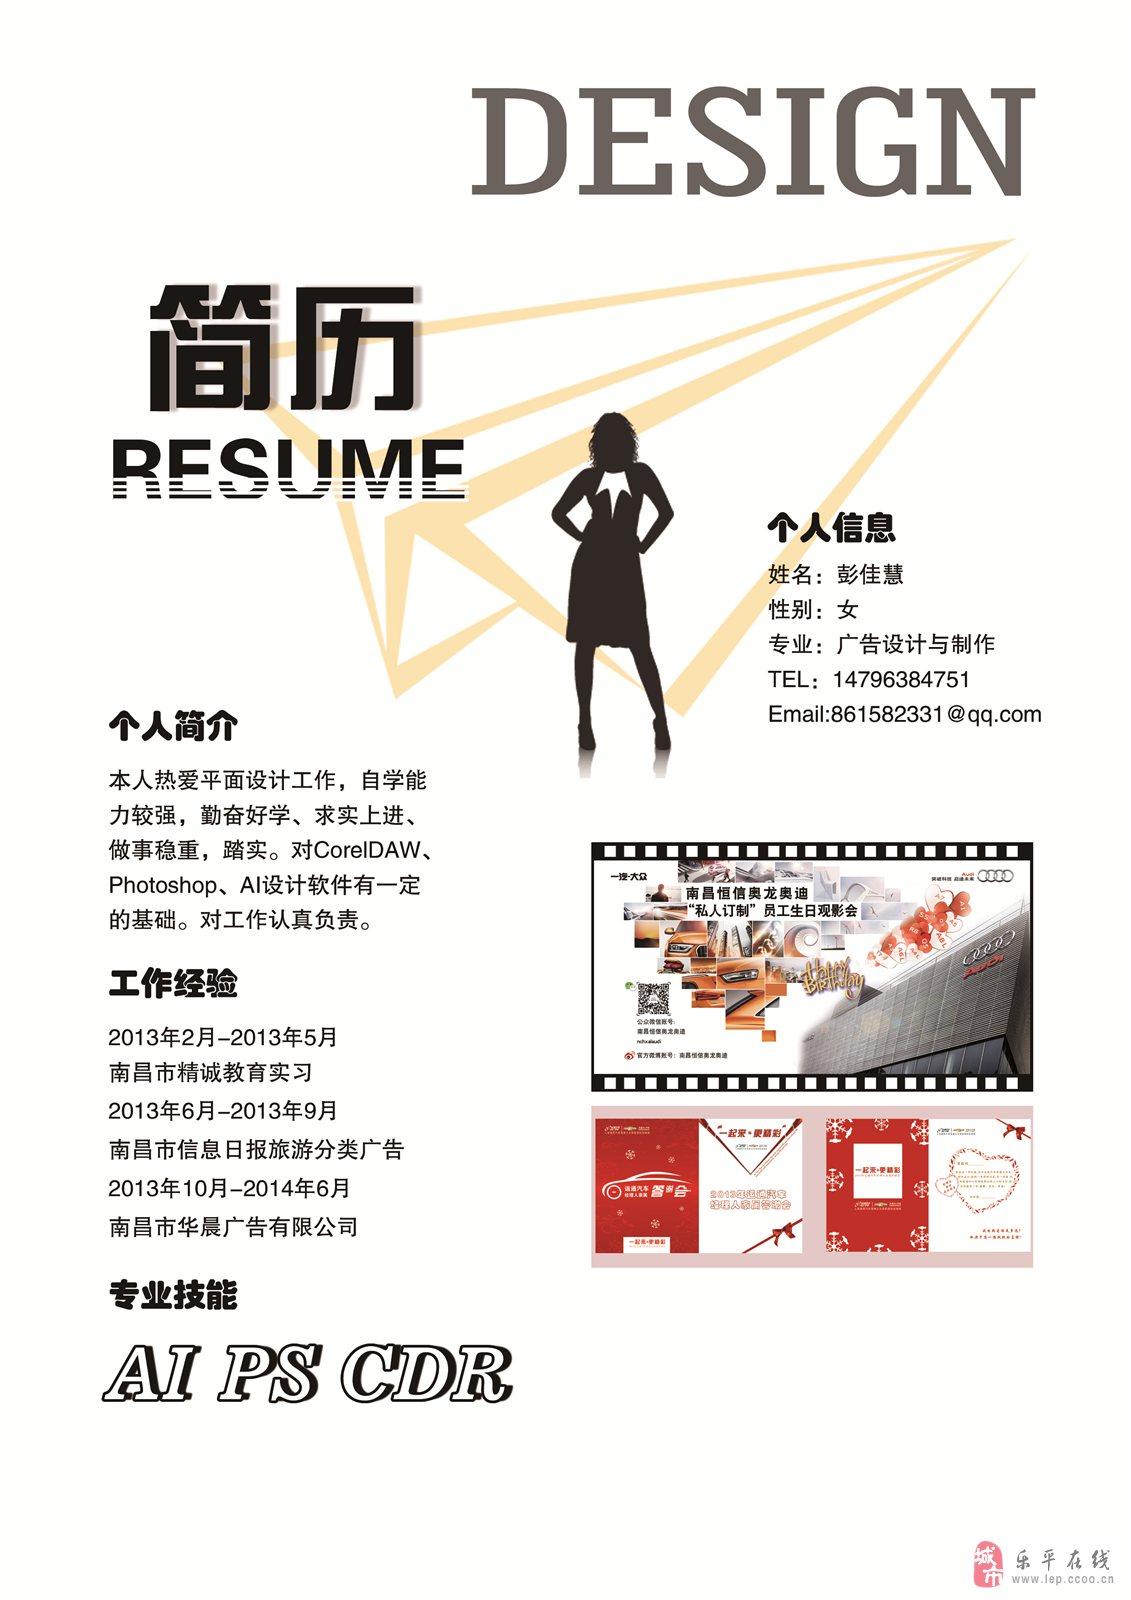 毕业海报cdr制作步骤